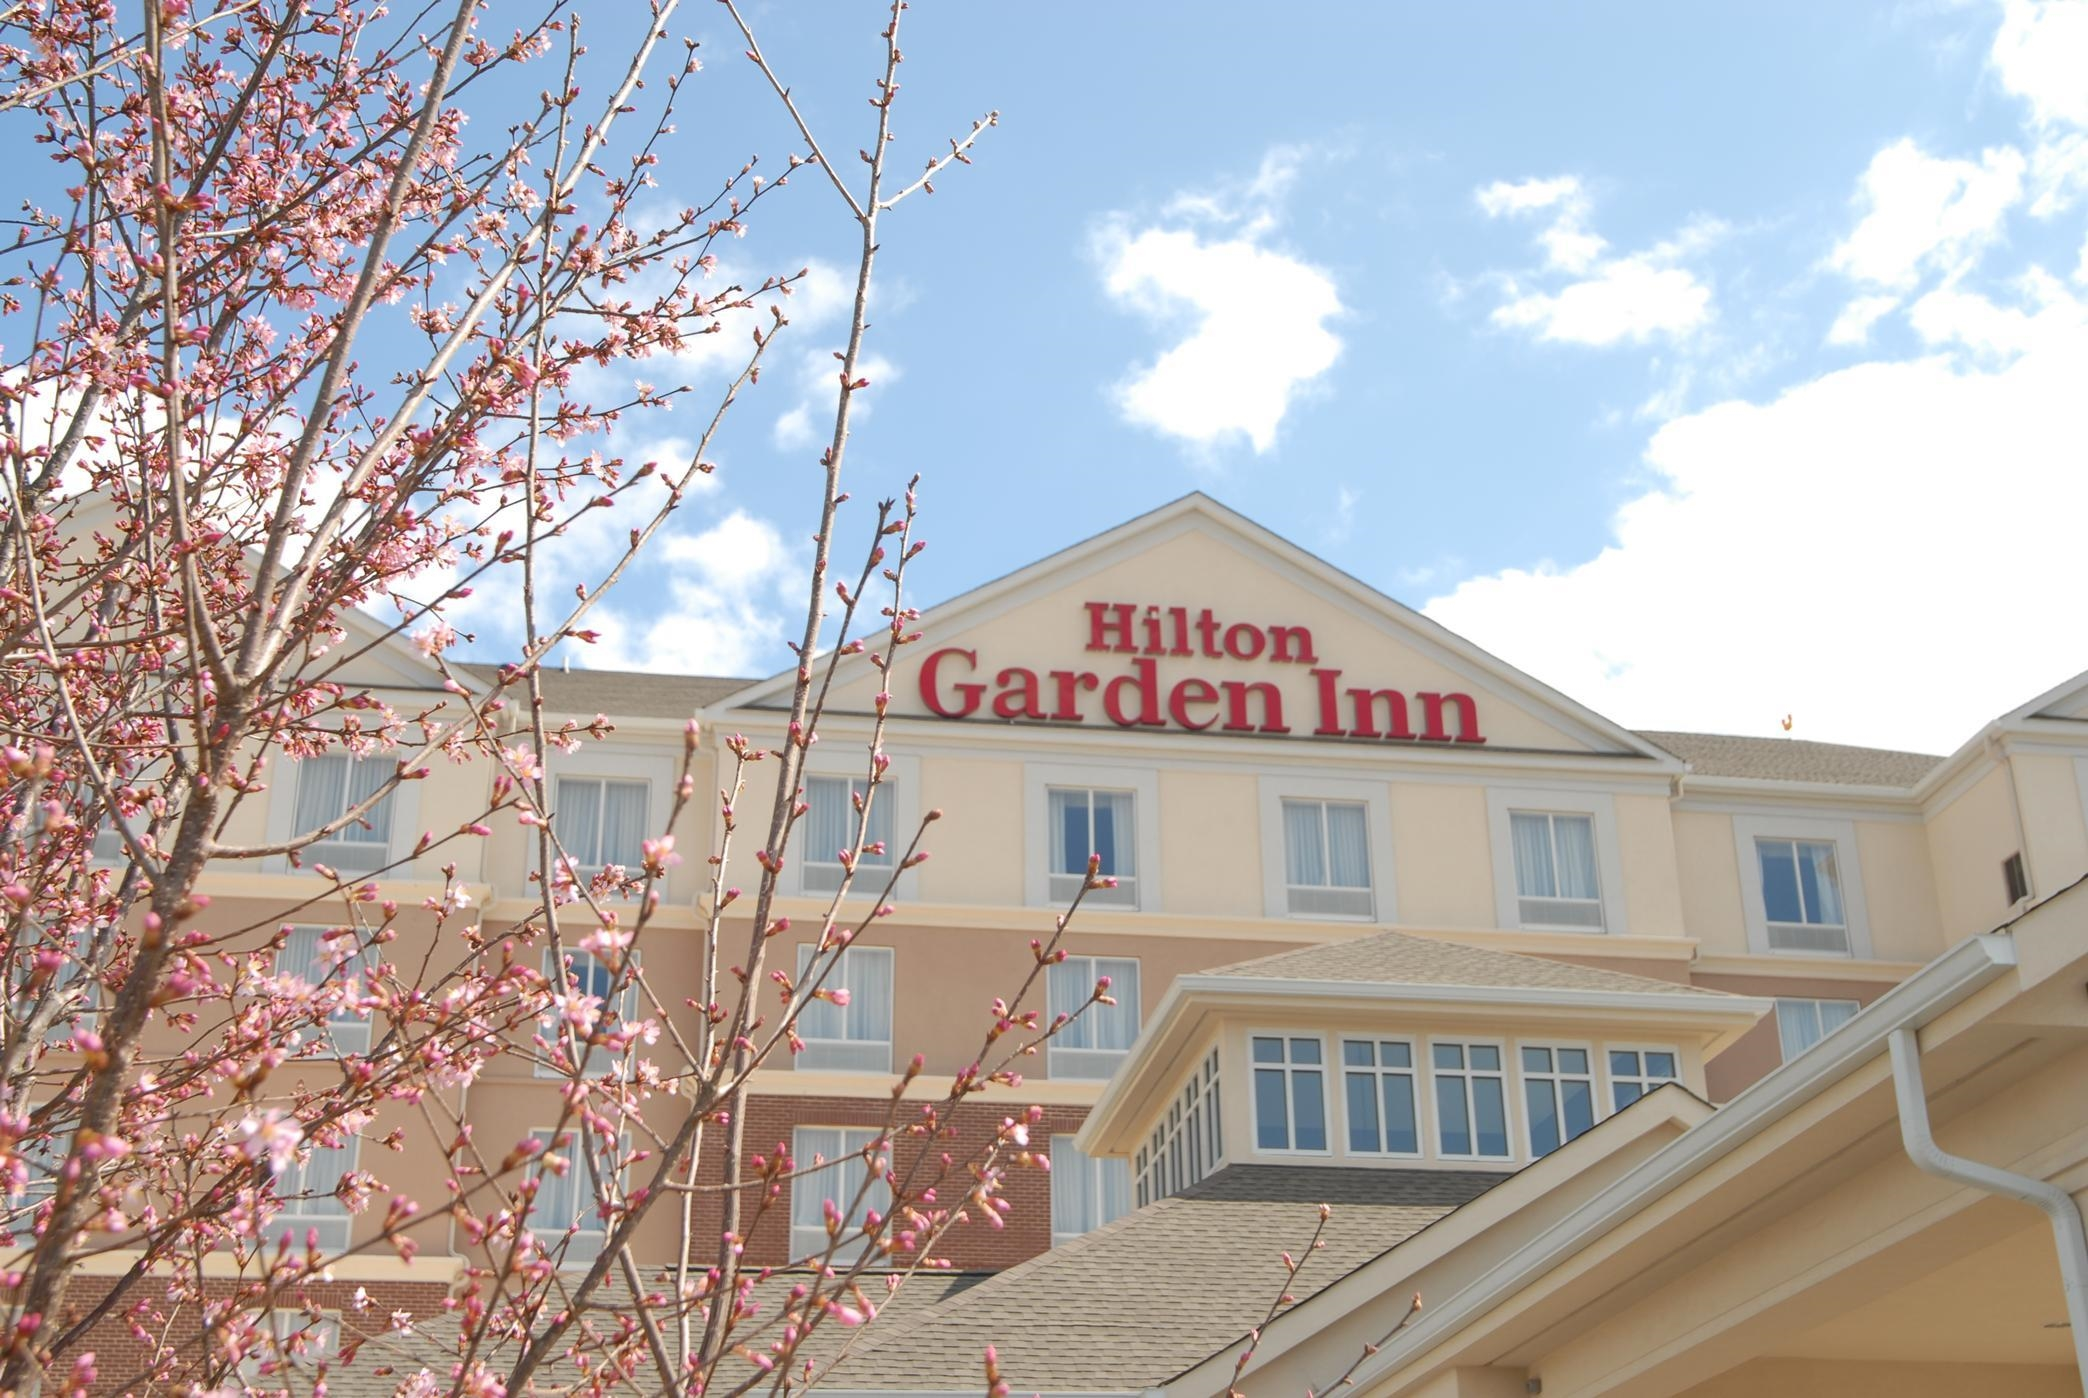 Hilton Garden Inn Charlotte/Concord image 0